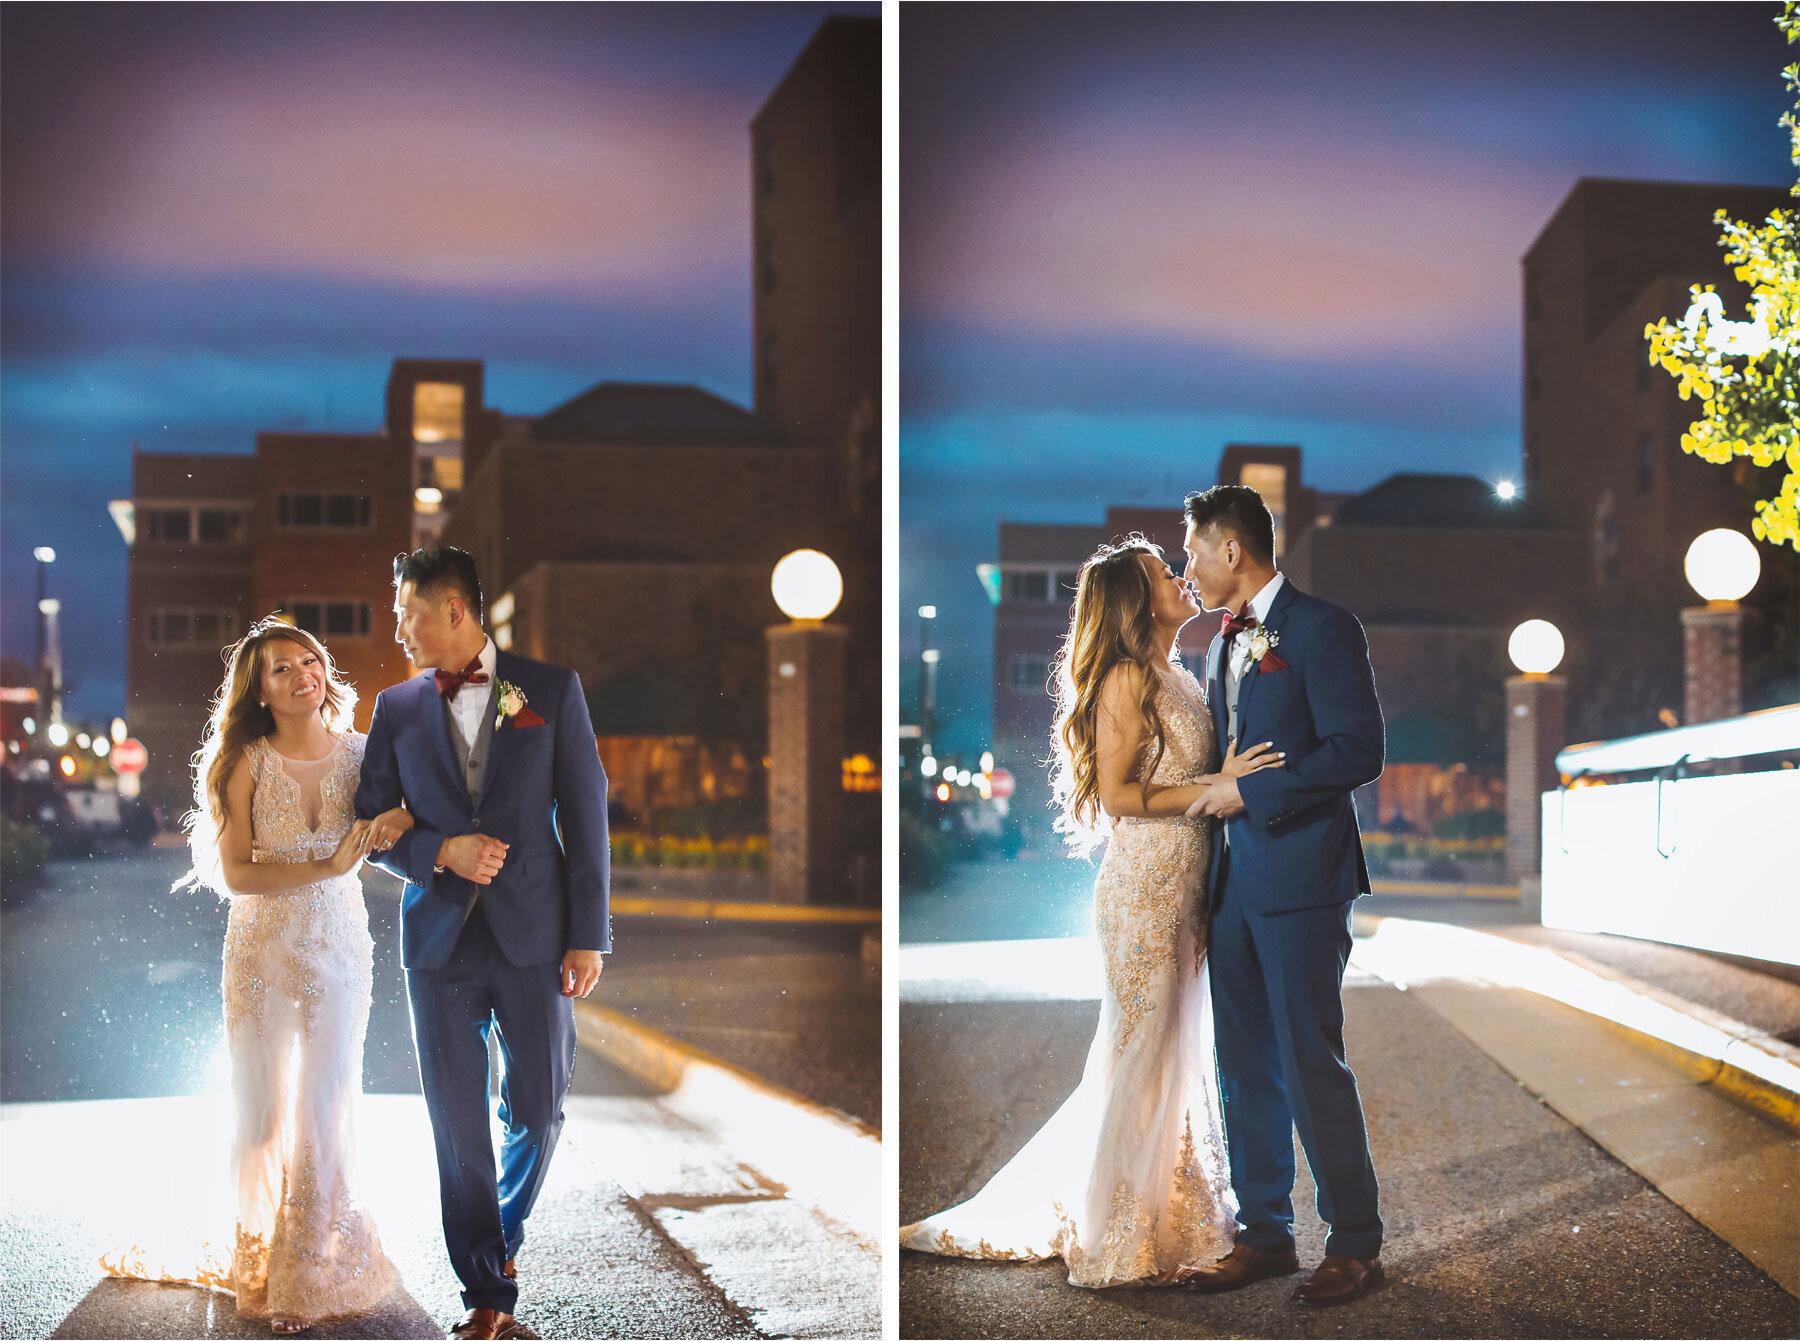 19-Vick-Photography-Minneapolis-Minnesota-Night-Bride-Groom-Kiss-Mai-&-Ross.jpg